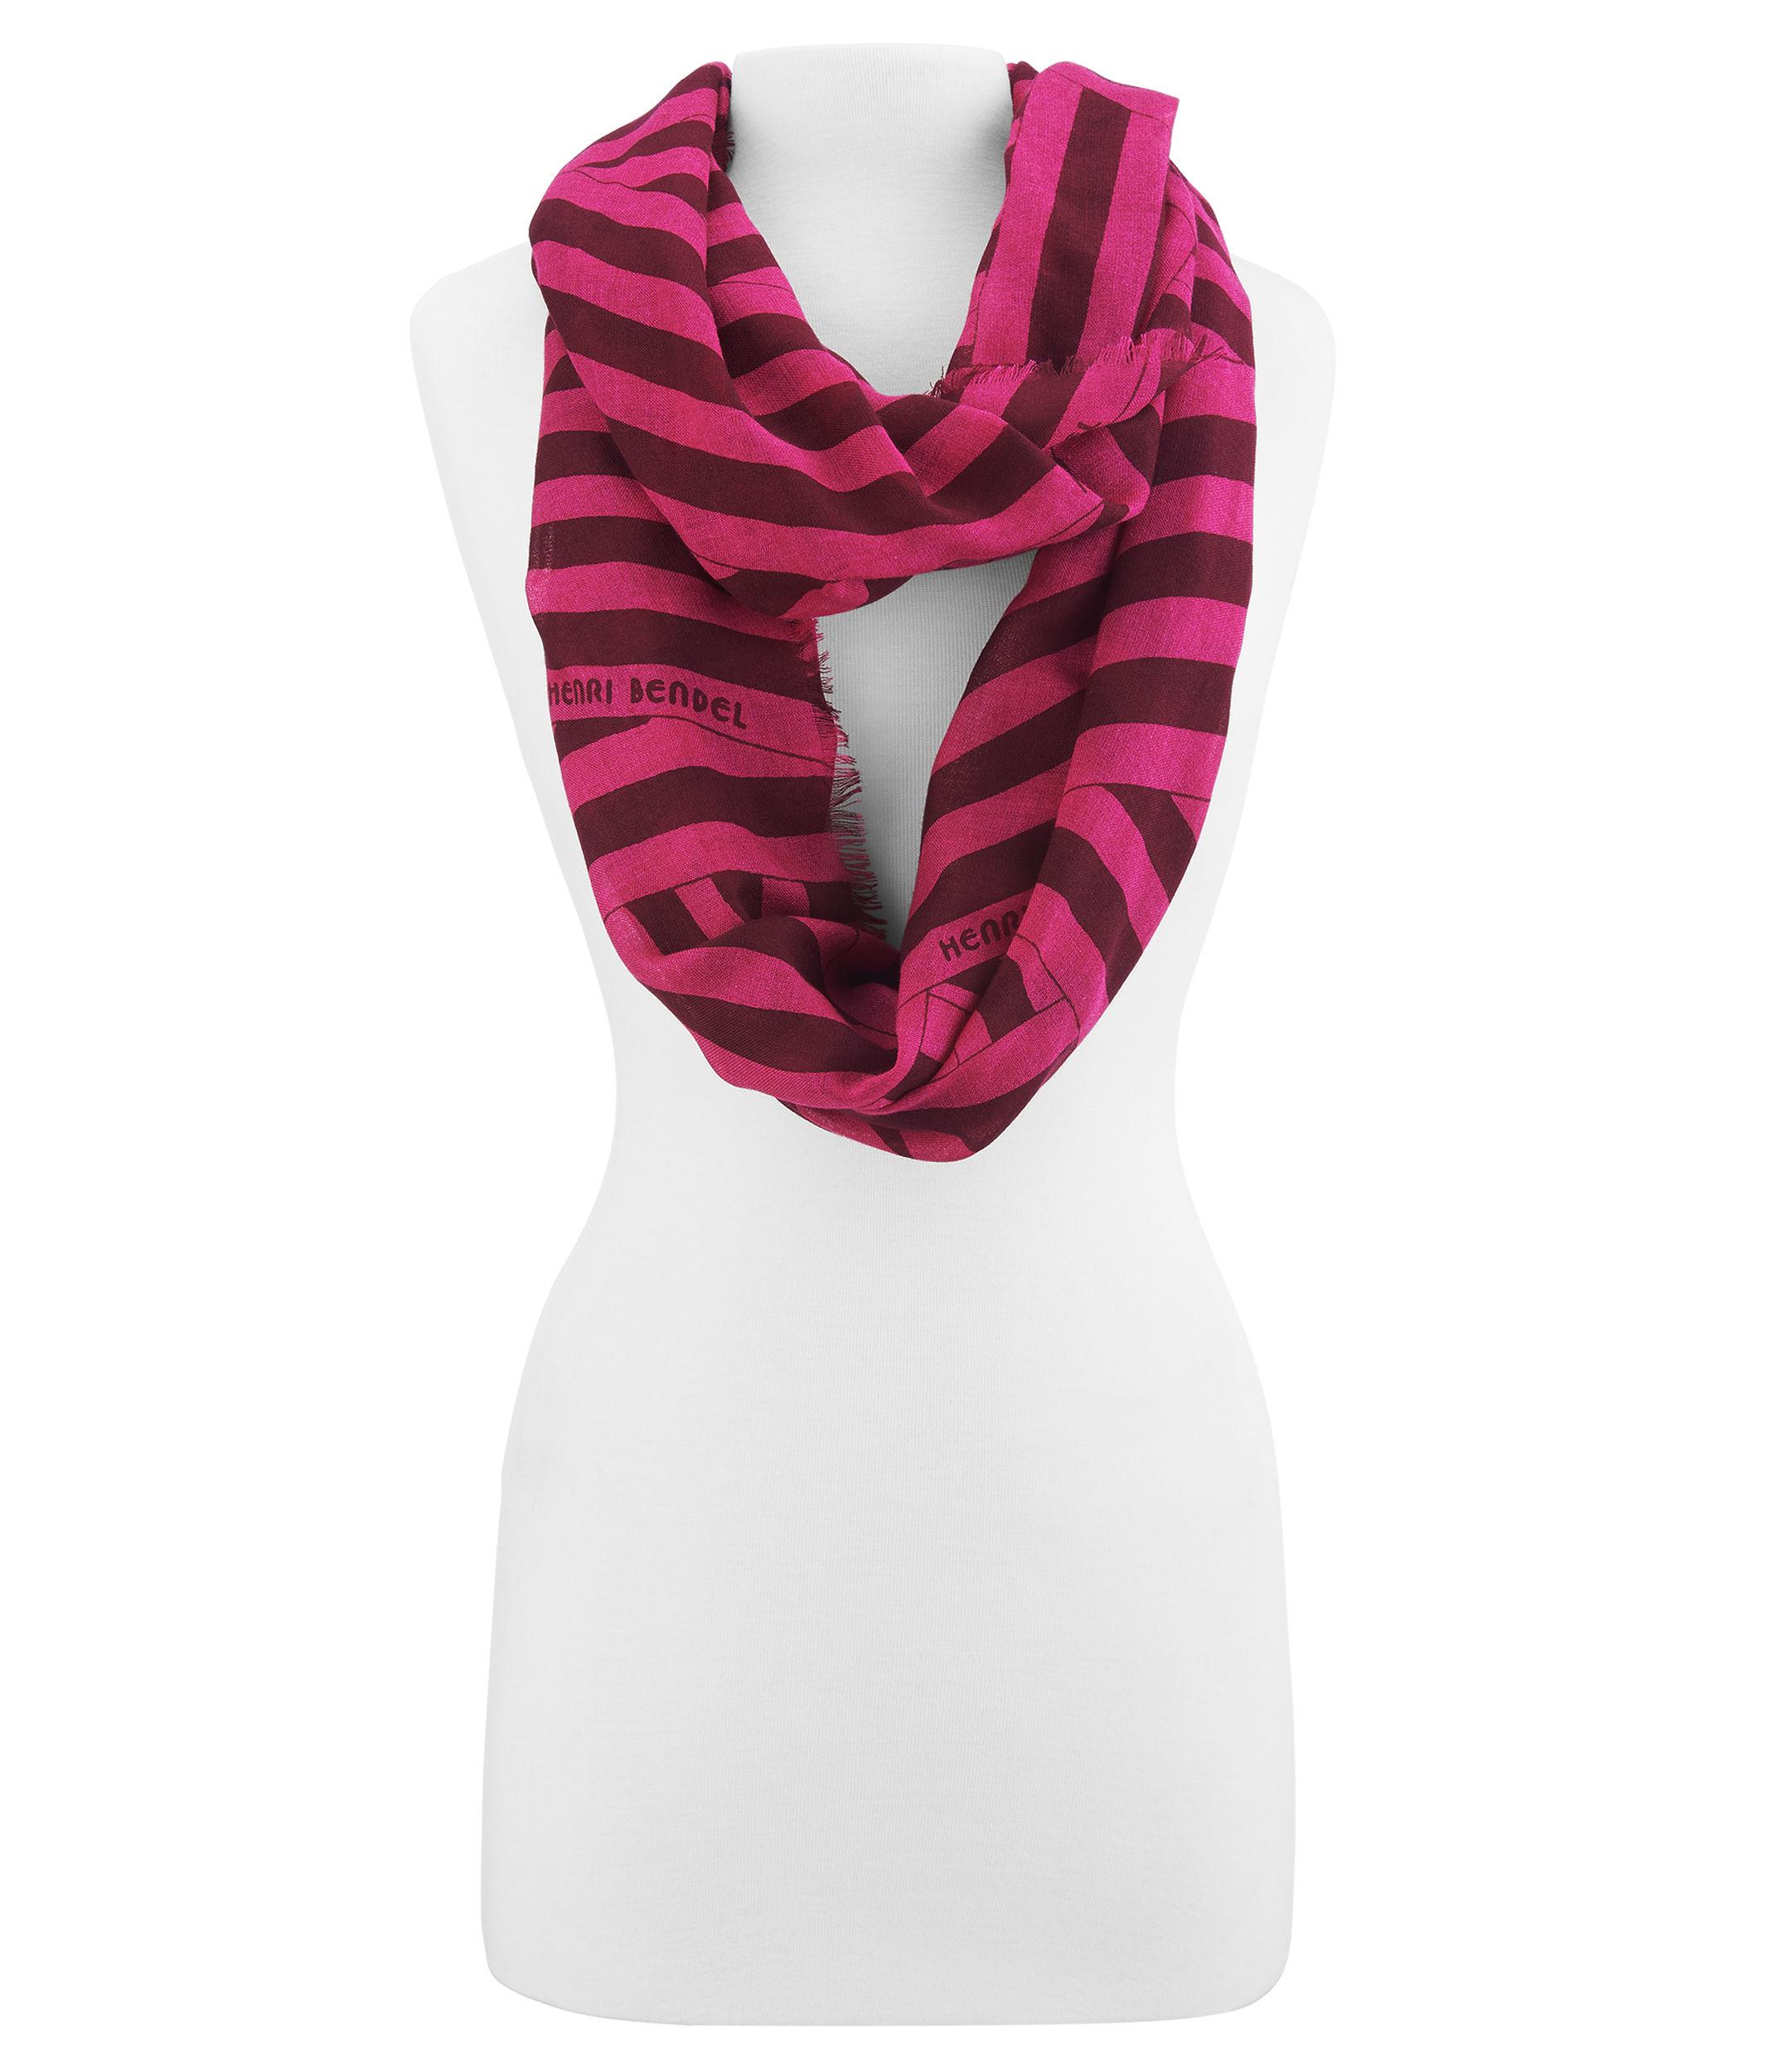 henri bendel disturbed stripe infinity scarf in pink lyst